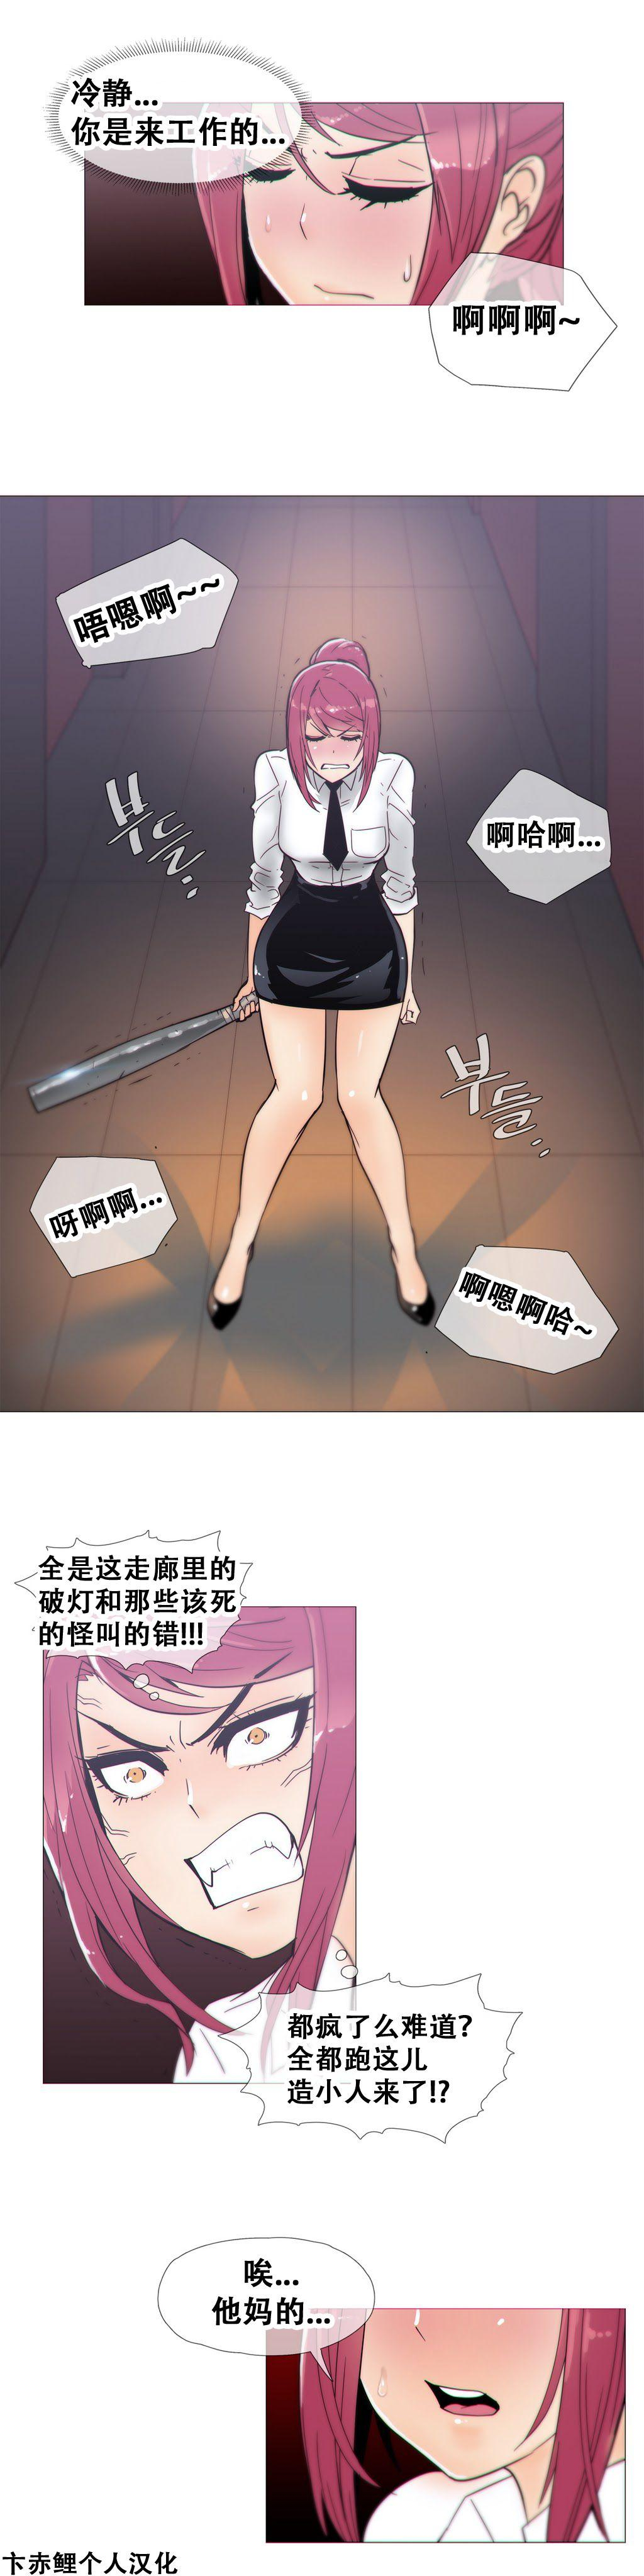 HouseHold Affairs 【卞赤鲤个人汉化】1~33话(持续更新中) 308